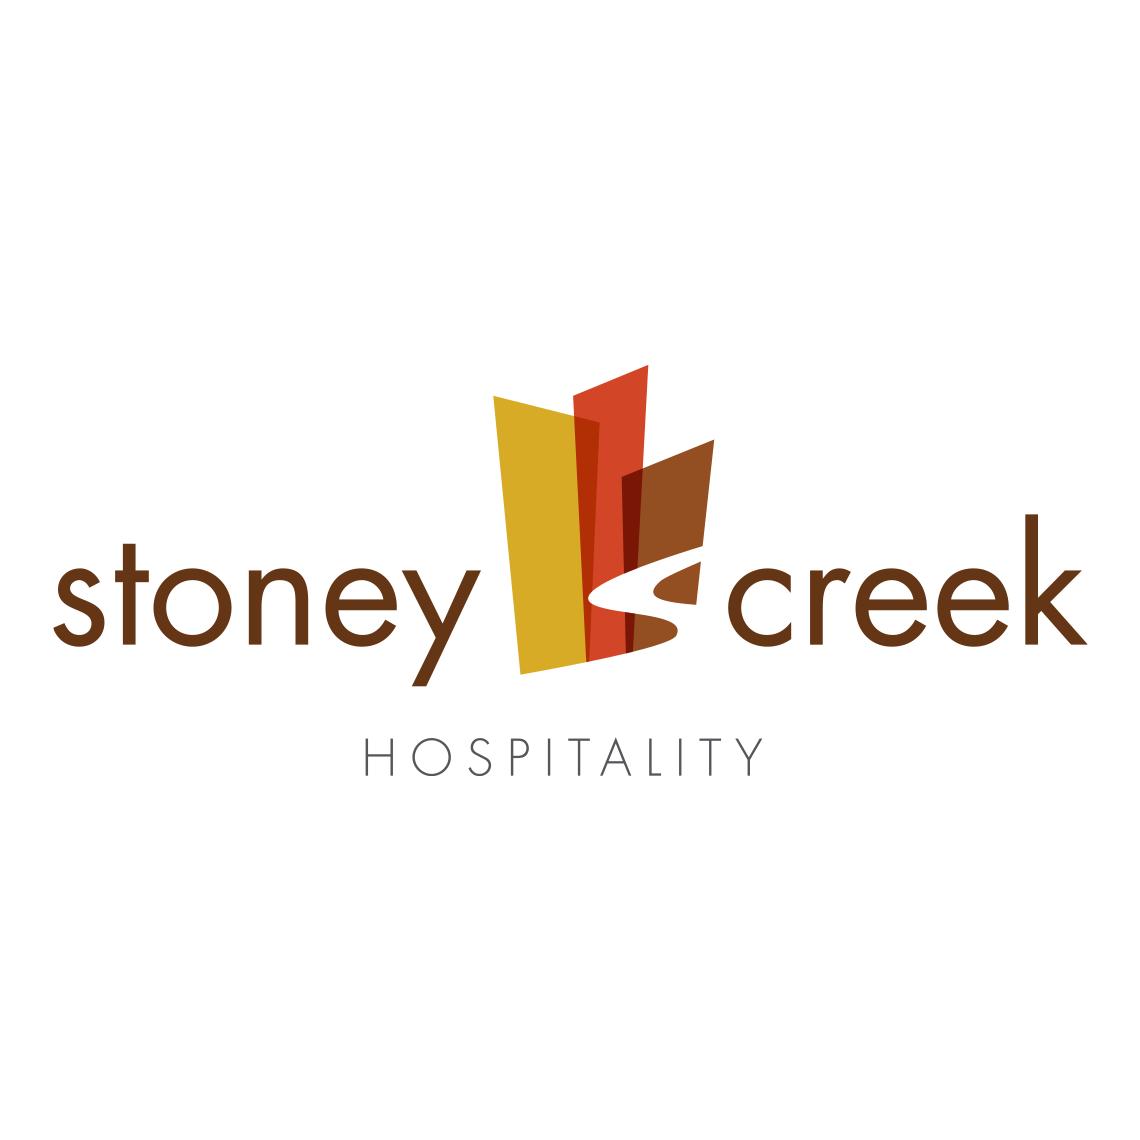 Stoney creek.png